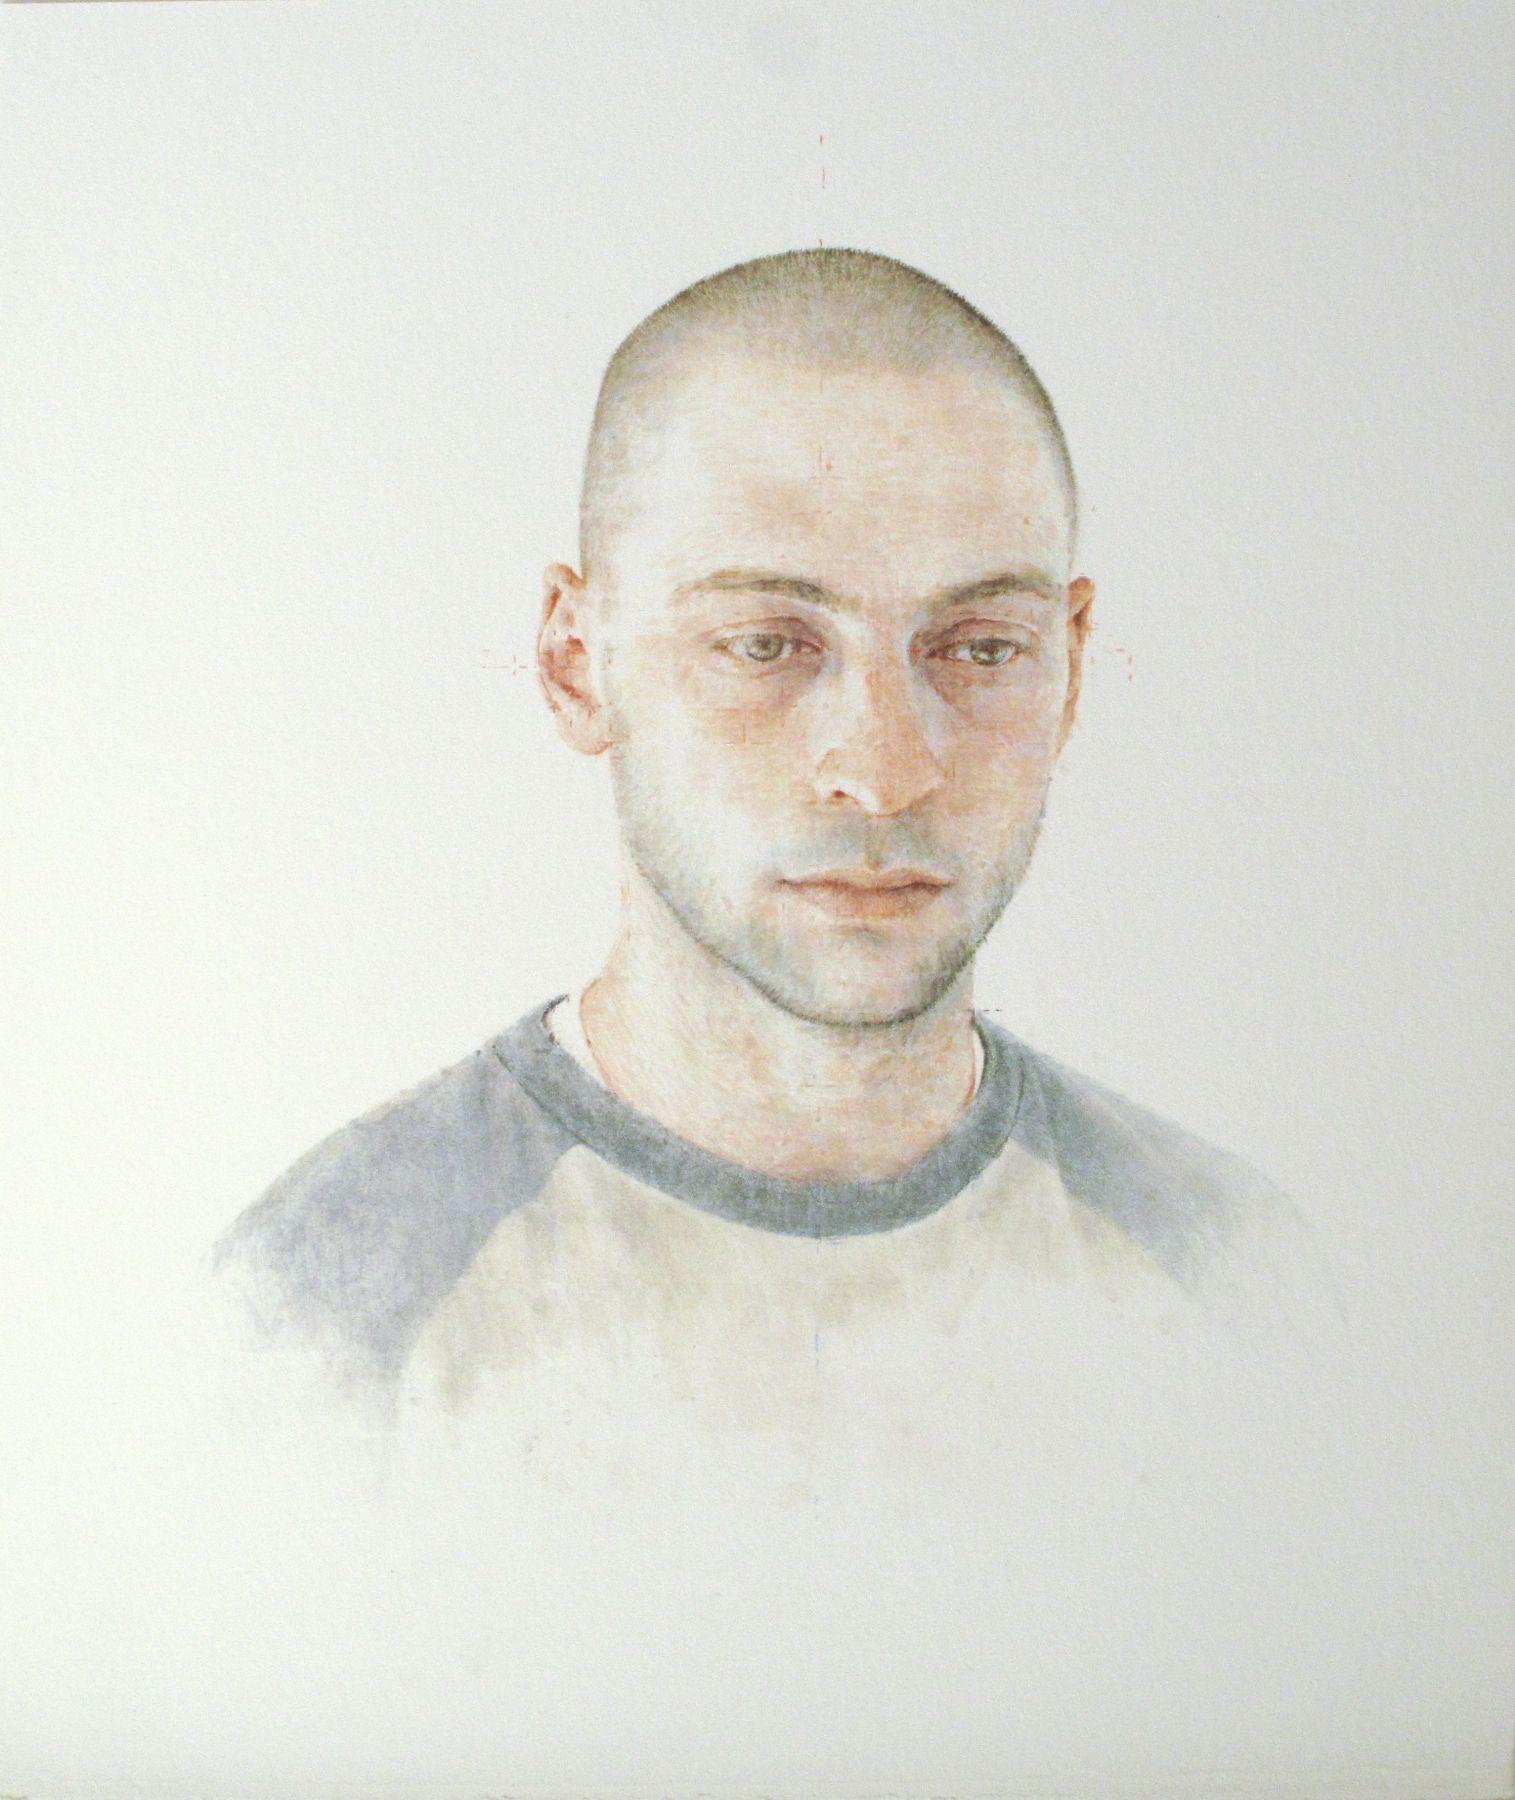 Robert Bauer, Adam (SOLD), 2011, tempera on paper, 12 x 10 inches